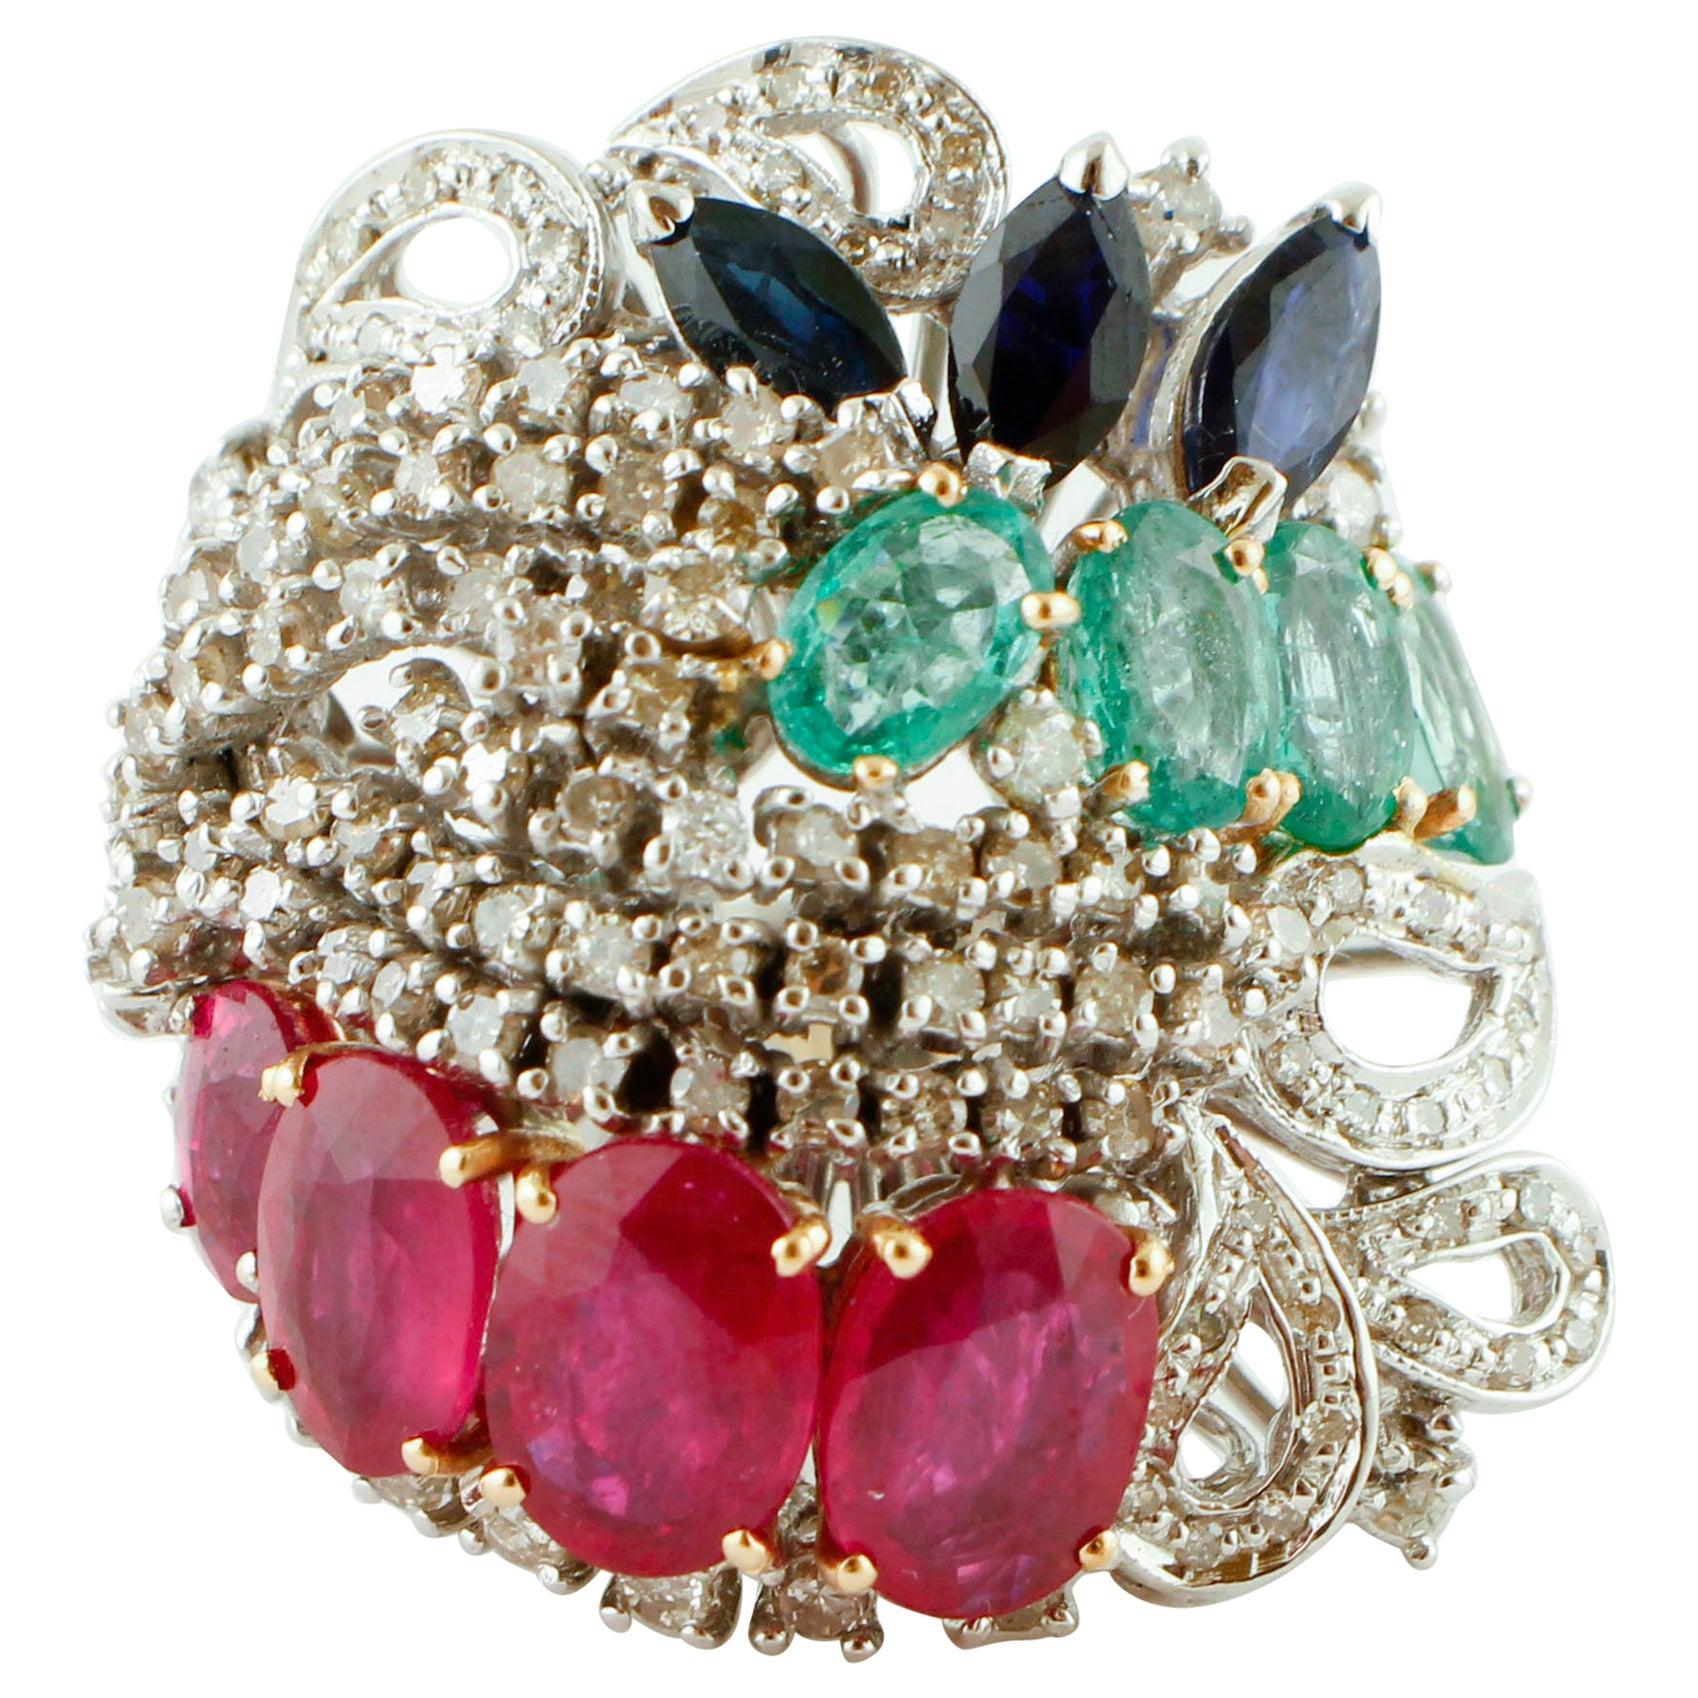 Oval Rubies, Oval Emeralds, Navette Blue Sapphires, Diamonds, 18 Karat Gold Ring